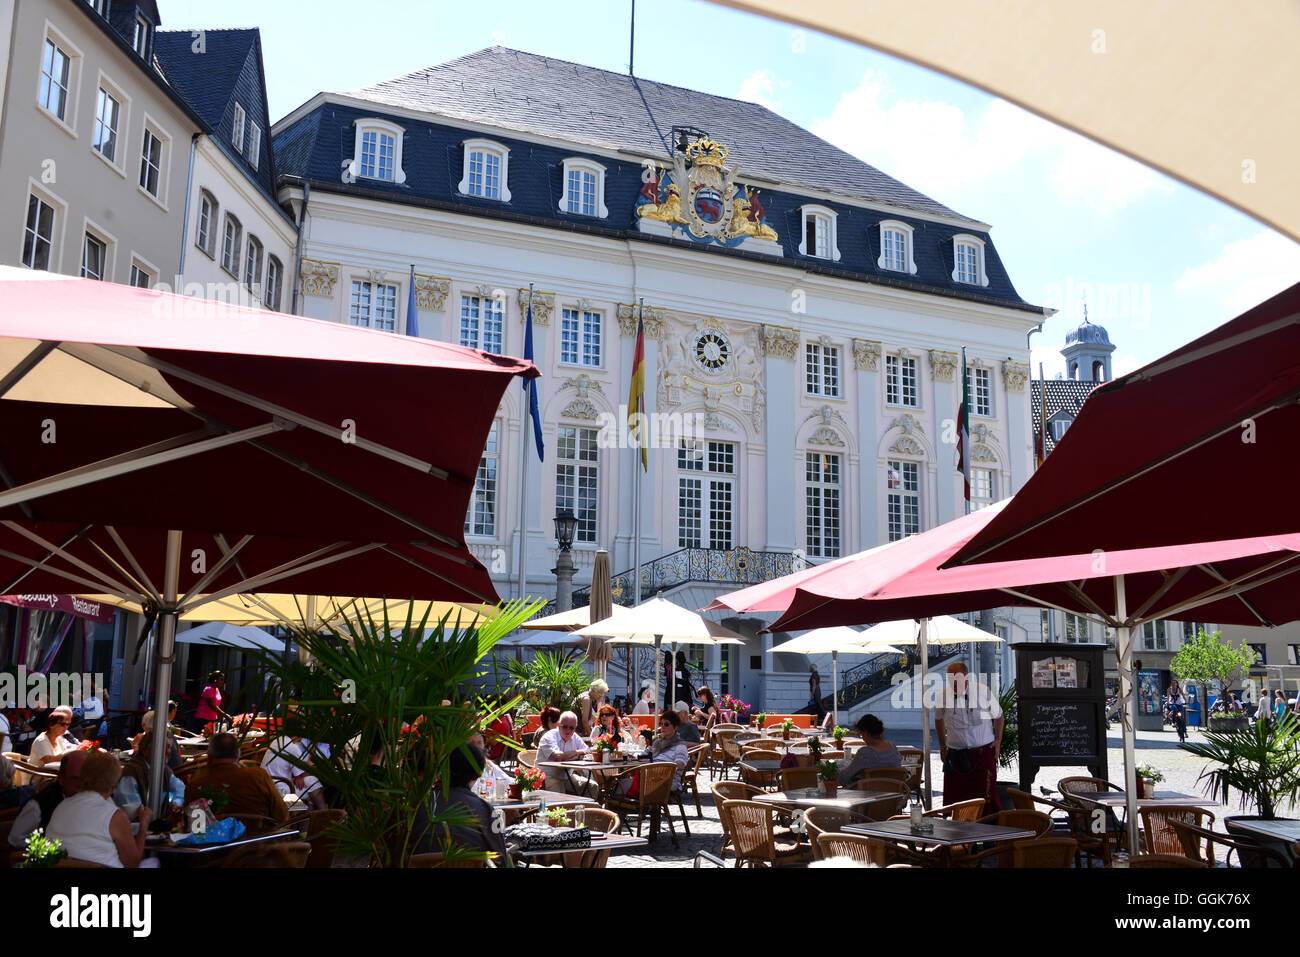 Market square with old town hall, Bonn, Rhine, North Rhine-Westphalia, Germany - Stock Image